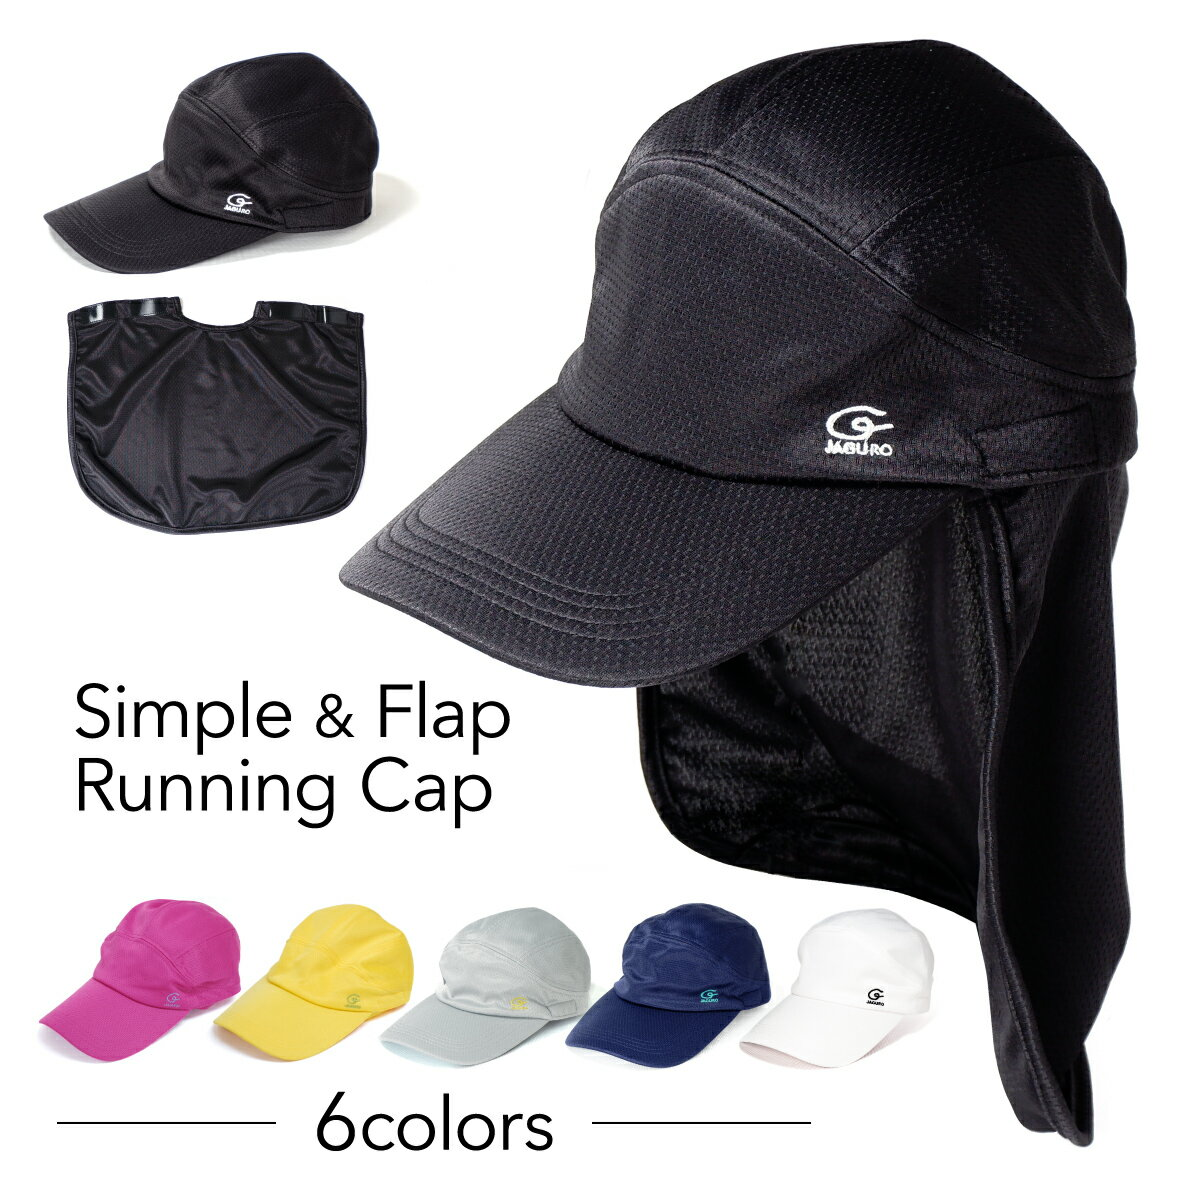 JAGURO日除け付きシンプルランニングキャップ帽子レディース